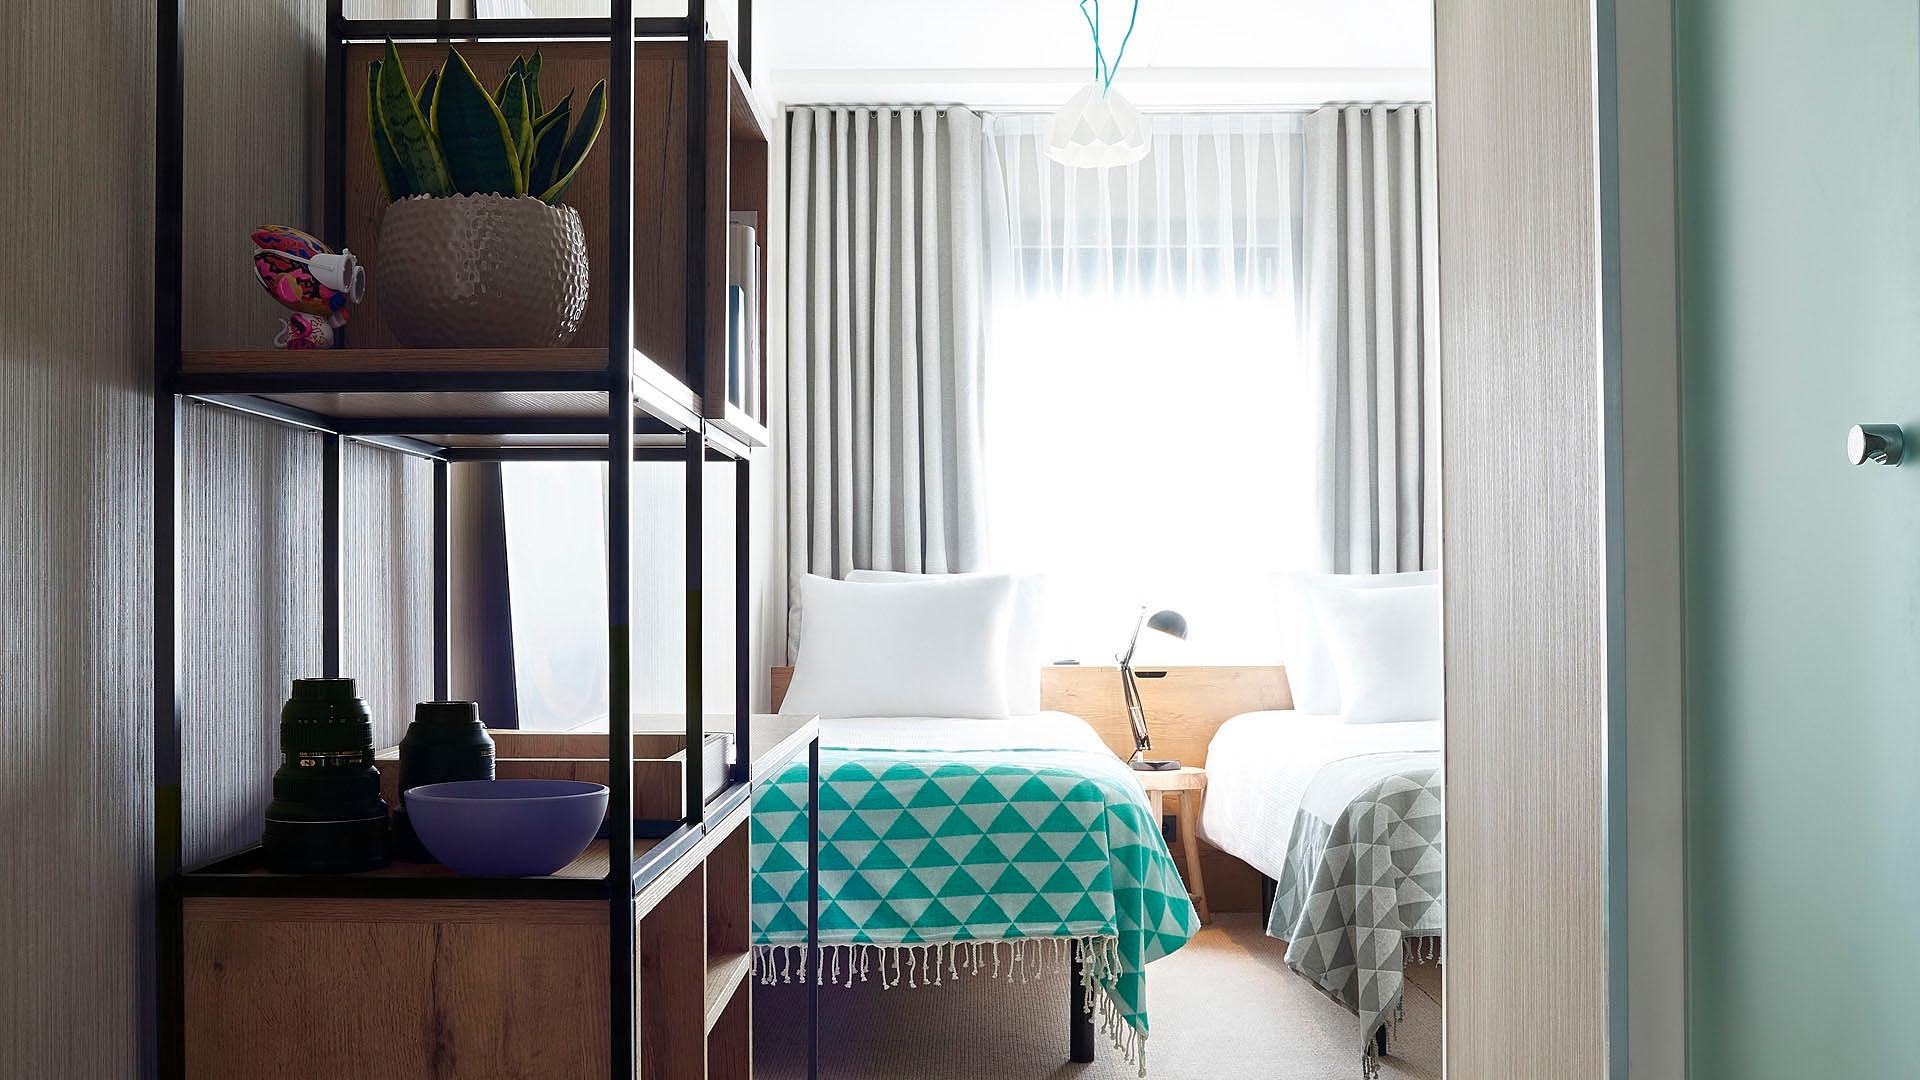 Good+Hotel+Amsterdam-TWIN2-webFS-3-2.jpg